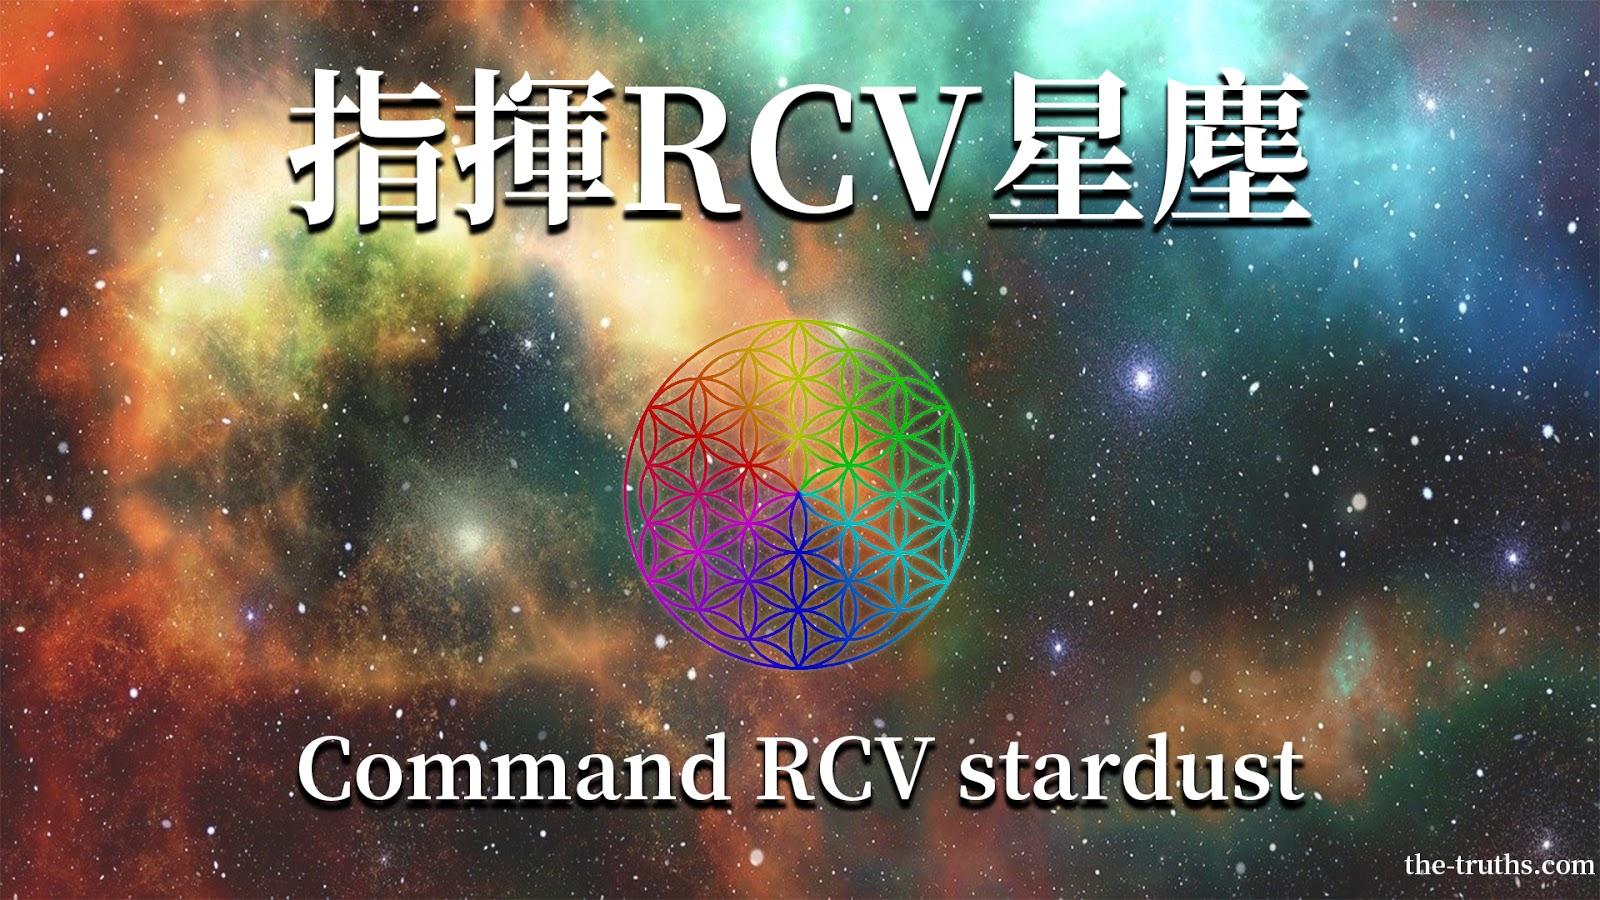 https://1.bp.blogspot.com/-_JvqPuY80kU/XwBeWhTKKCI/AAAAAAAAIyc/hGZW2WNT5MMzsyqSGH1CoySYvAOfUIQIgCNcBGAsYHQ/s320/Command%2BRCV%2Bstardust.jpg